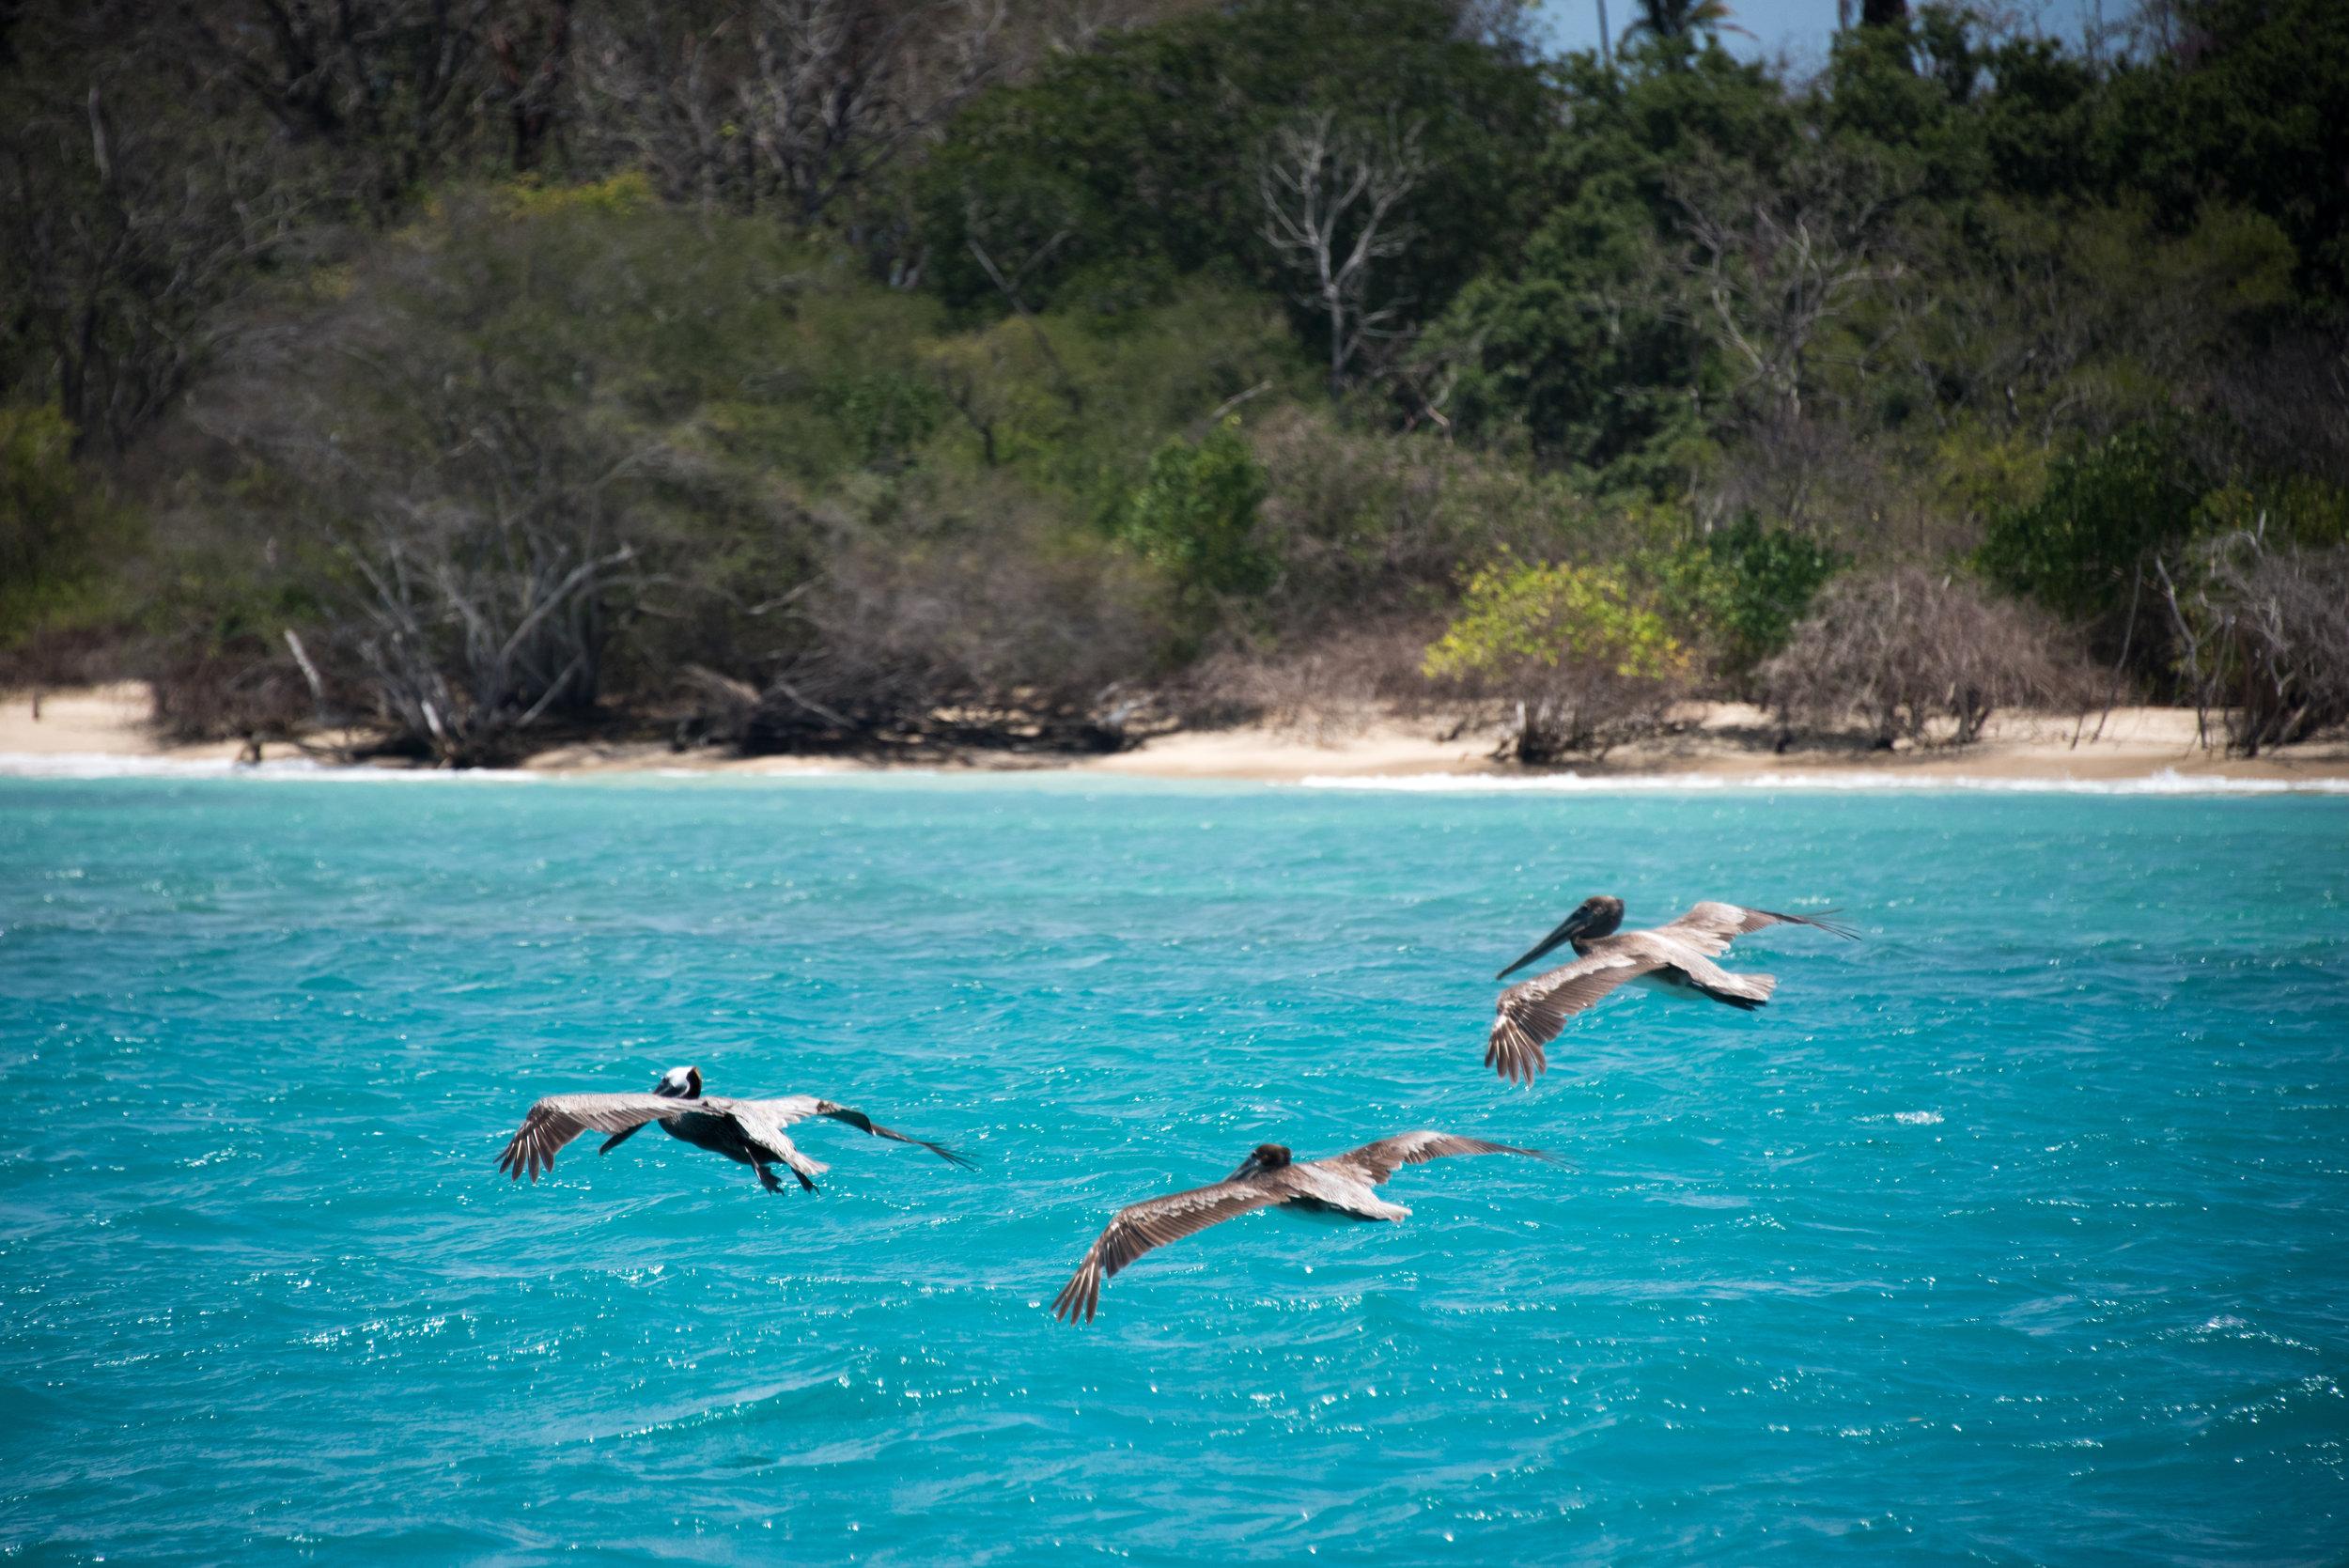 170422_Barrie Fisher_Tobago-503.jpg